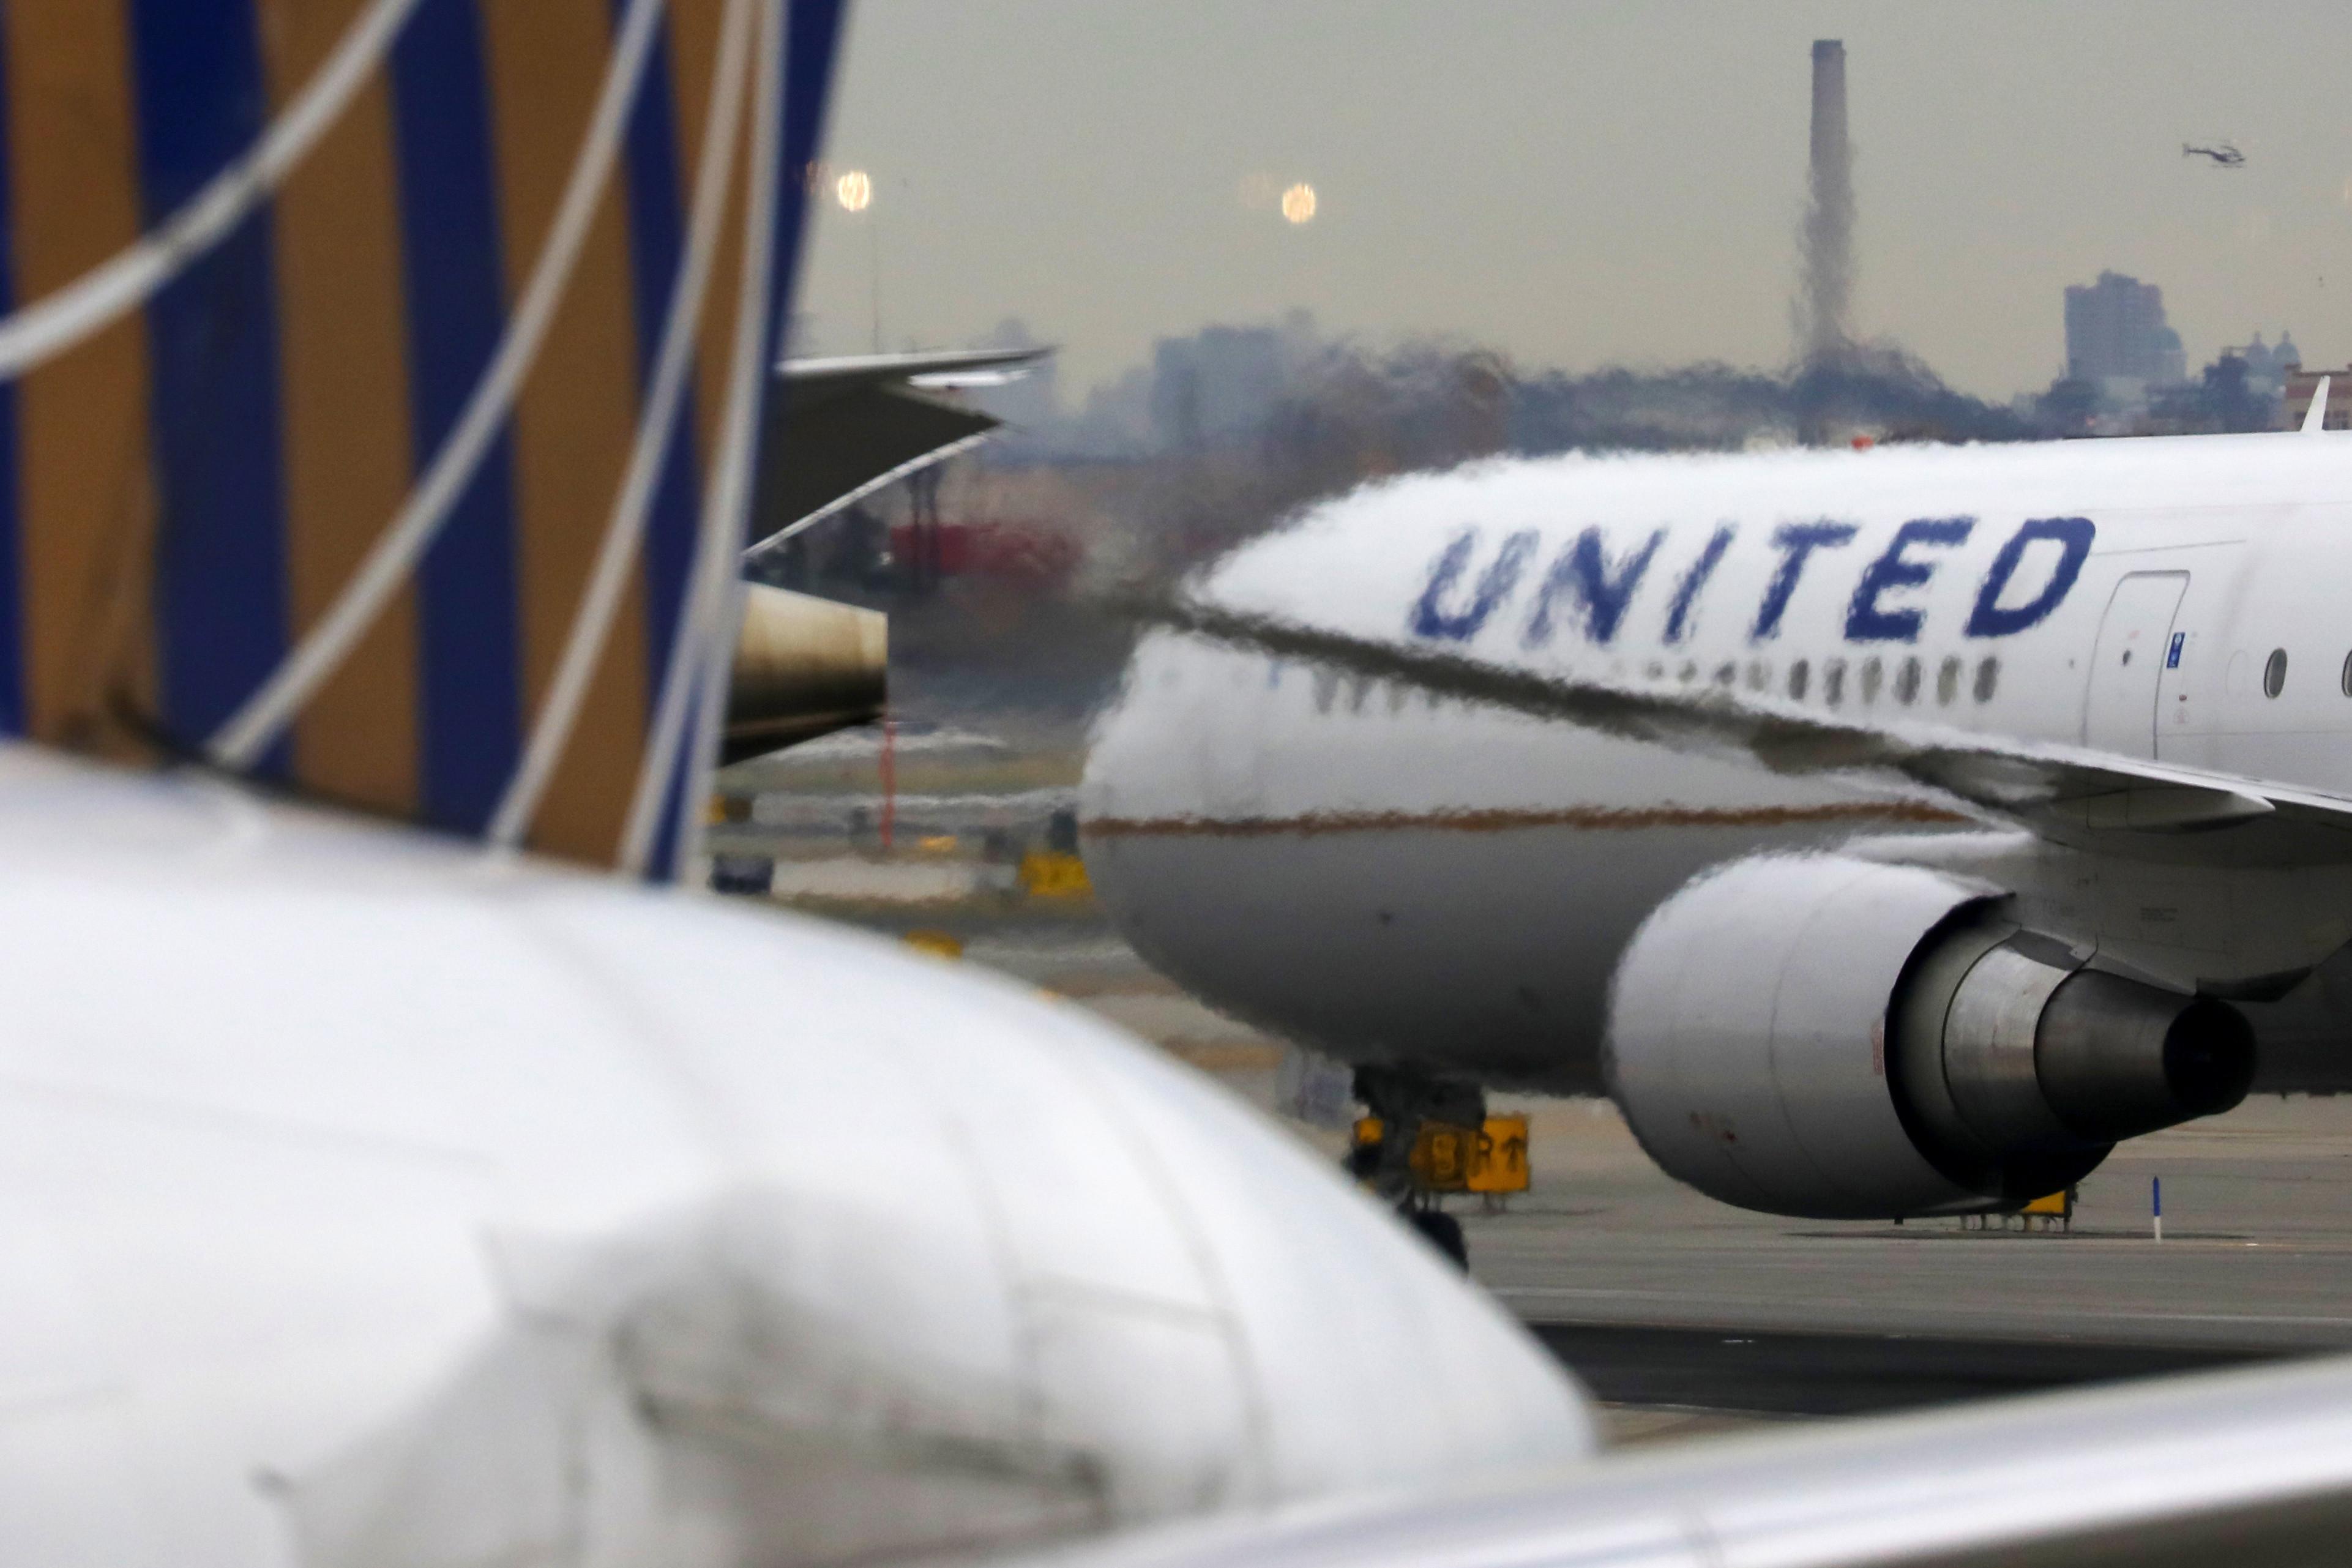 A United Airlines passenger jet taxis at Newark Liberty International Airport, New Jersey, U.S. December 6, 2019. REUTERS/Chris Helgren - RC2WPD913UQ2